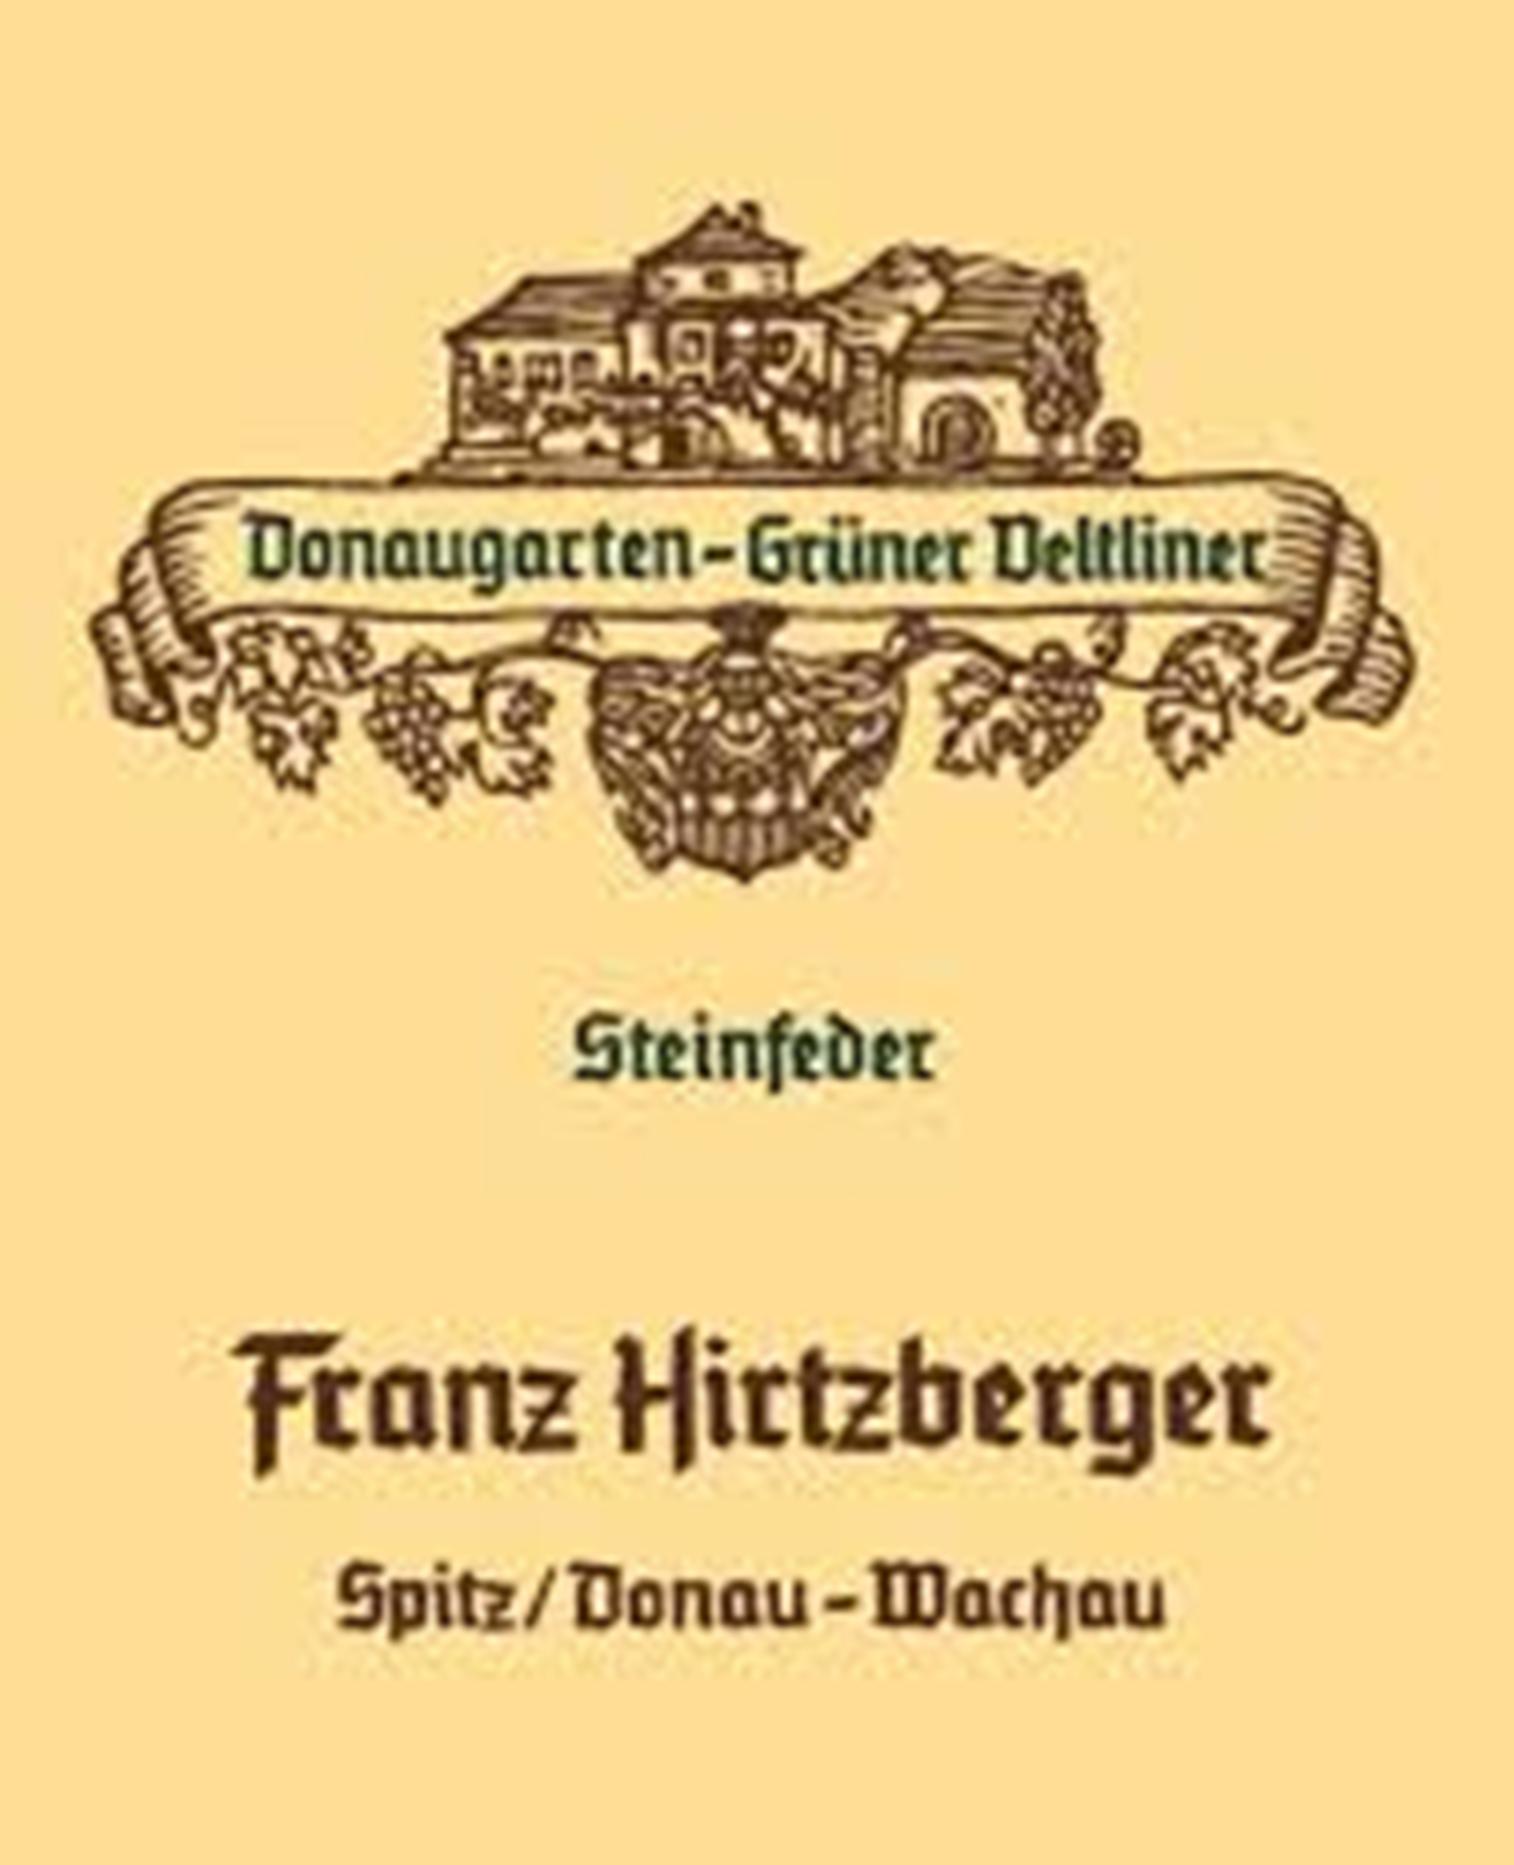 Franz Hirtzberger Spitz Gruner Veltliner Steinfeder 2018